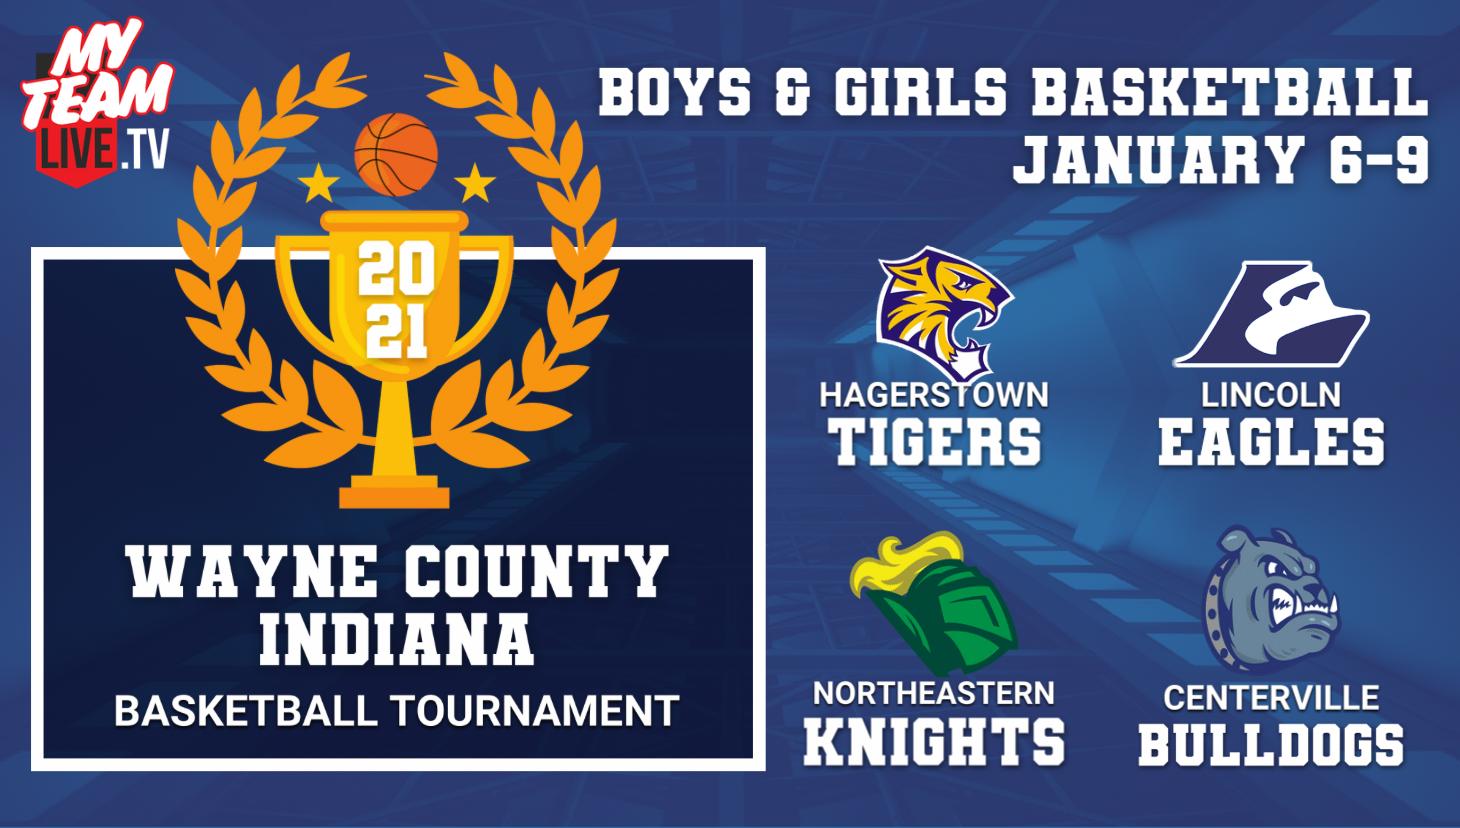 Wayne County Basketball Tournament Streaming